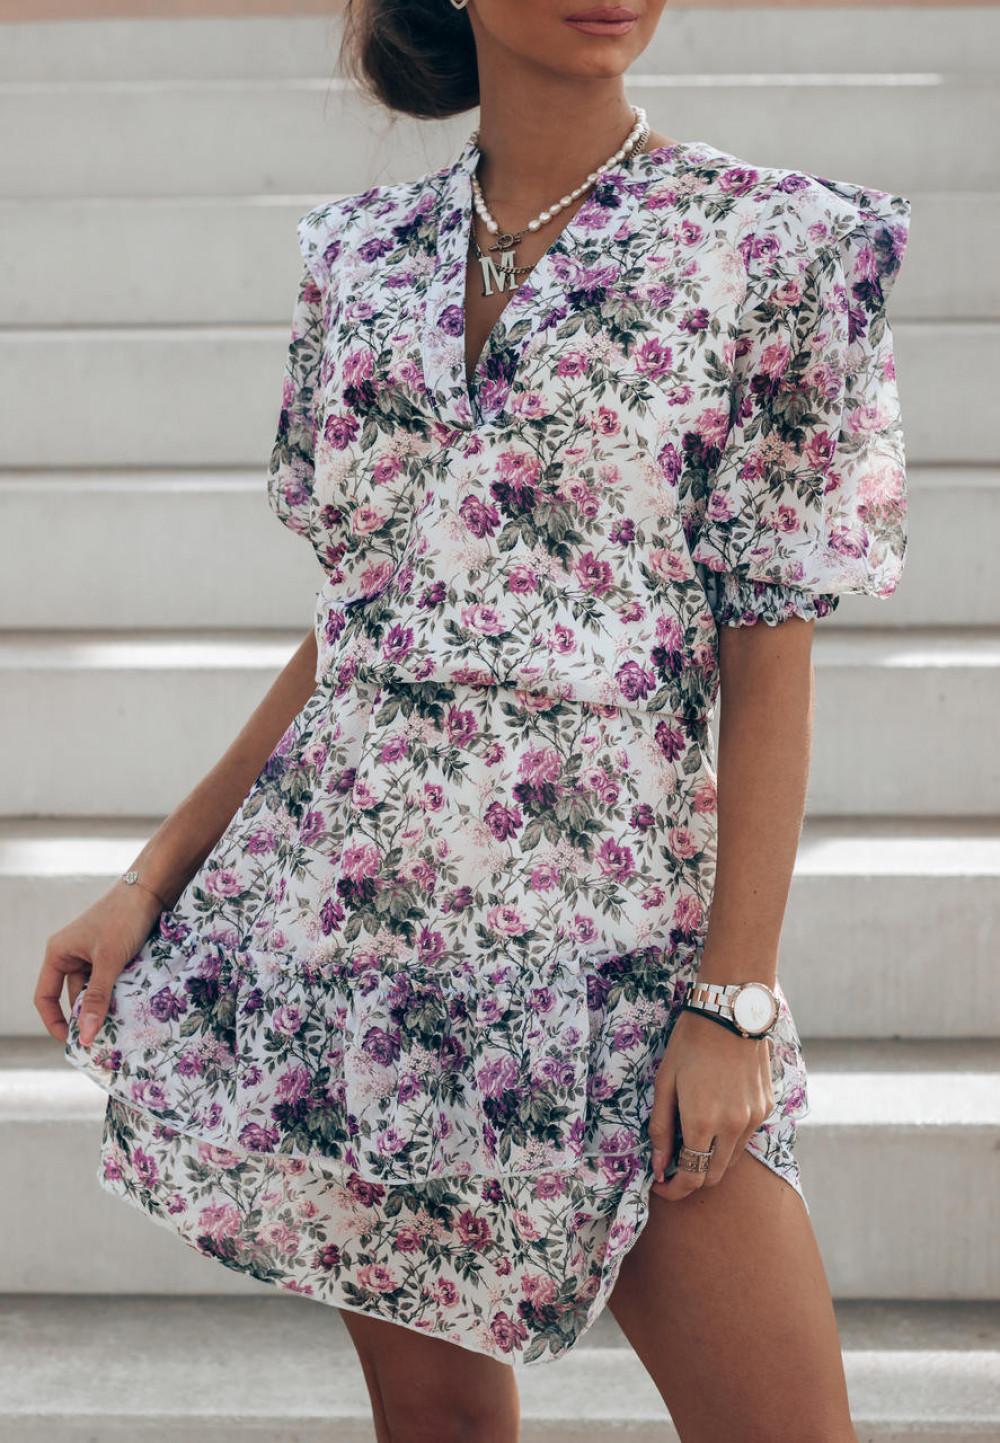 Fioletowa kwiatowa rozkloszowana sukienka V-Neck Caterina 2